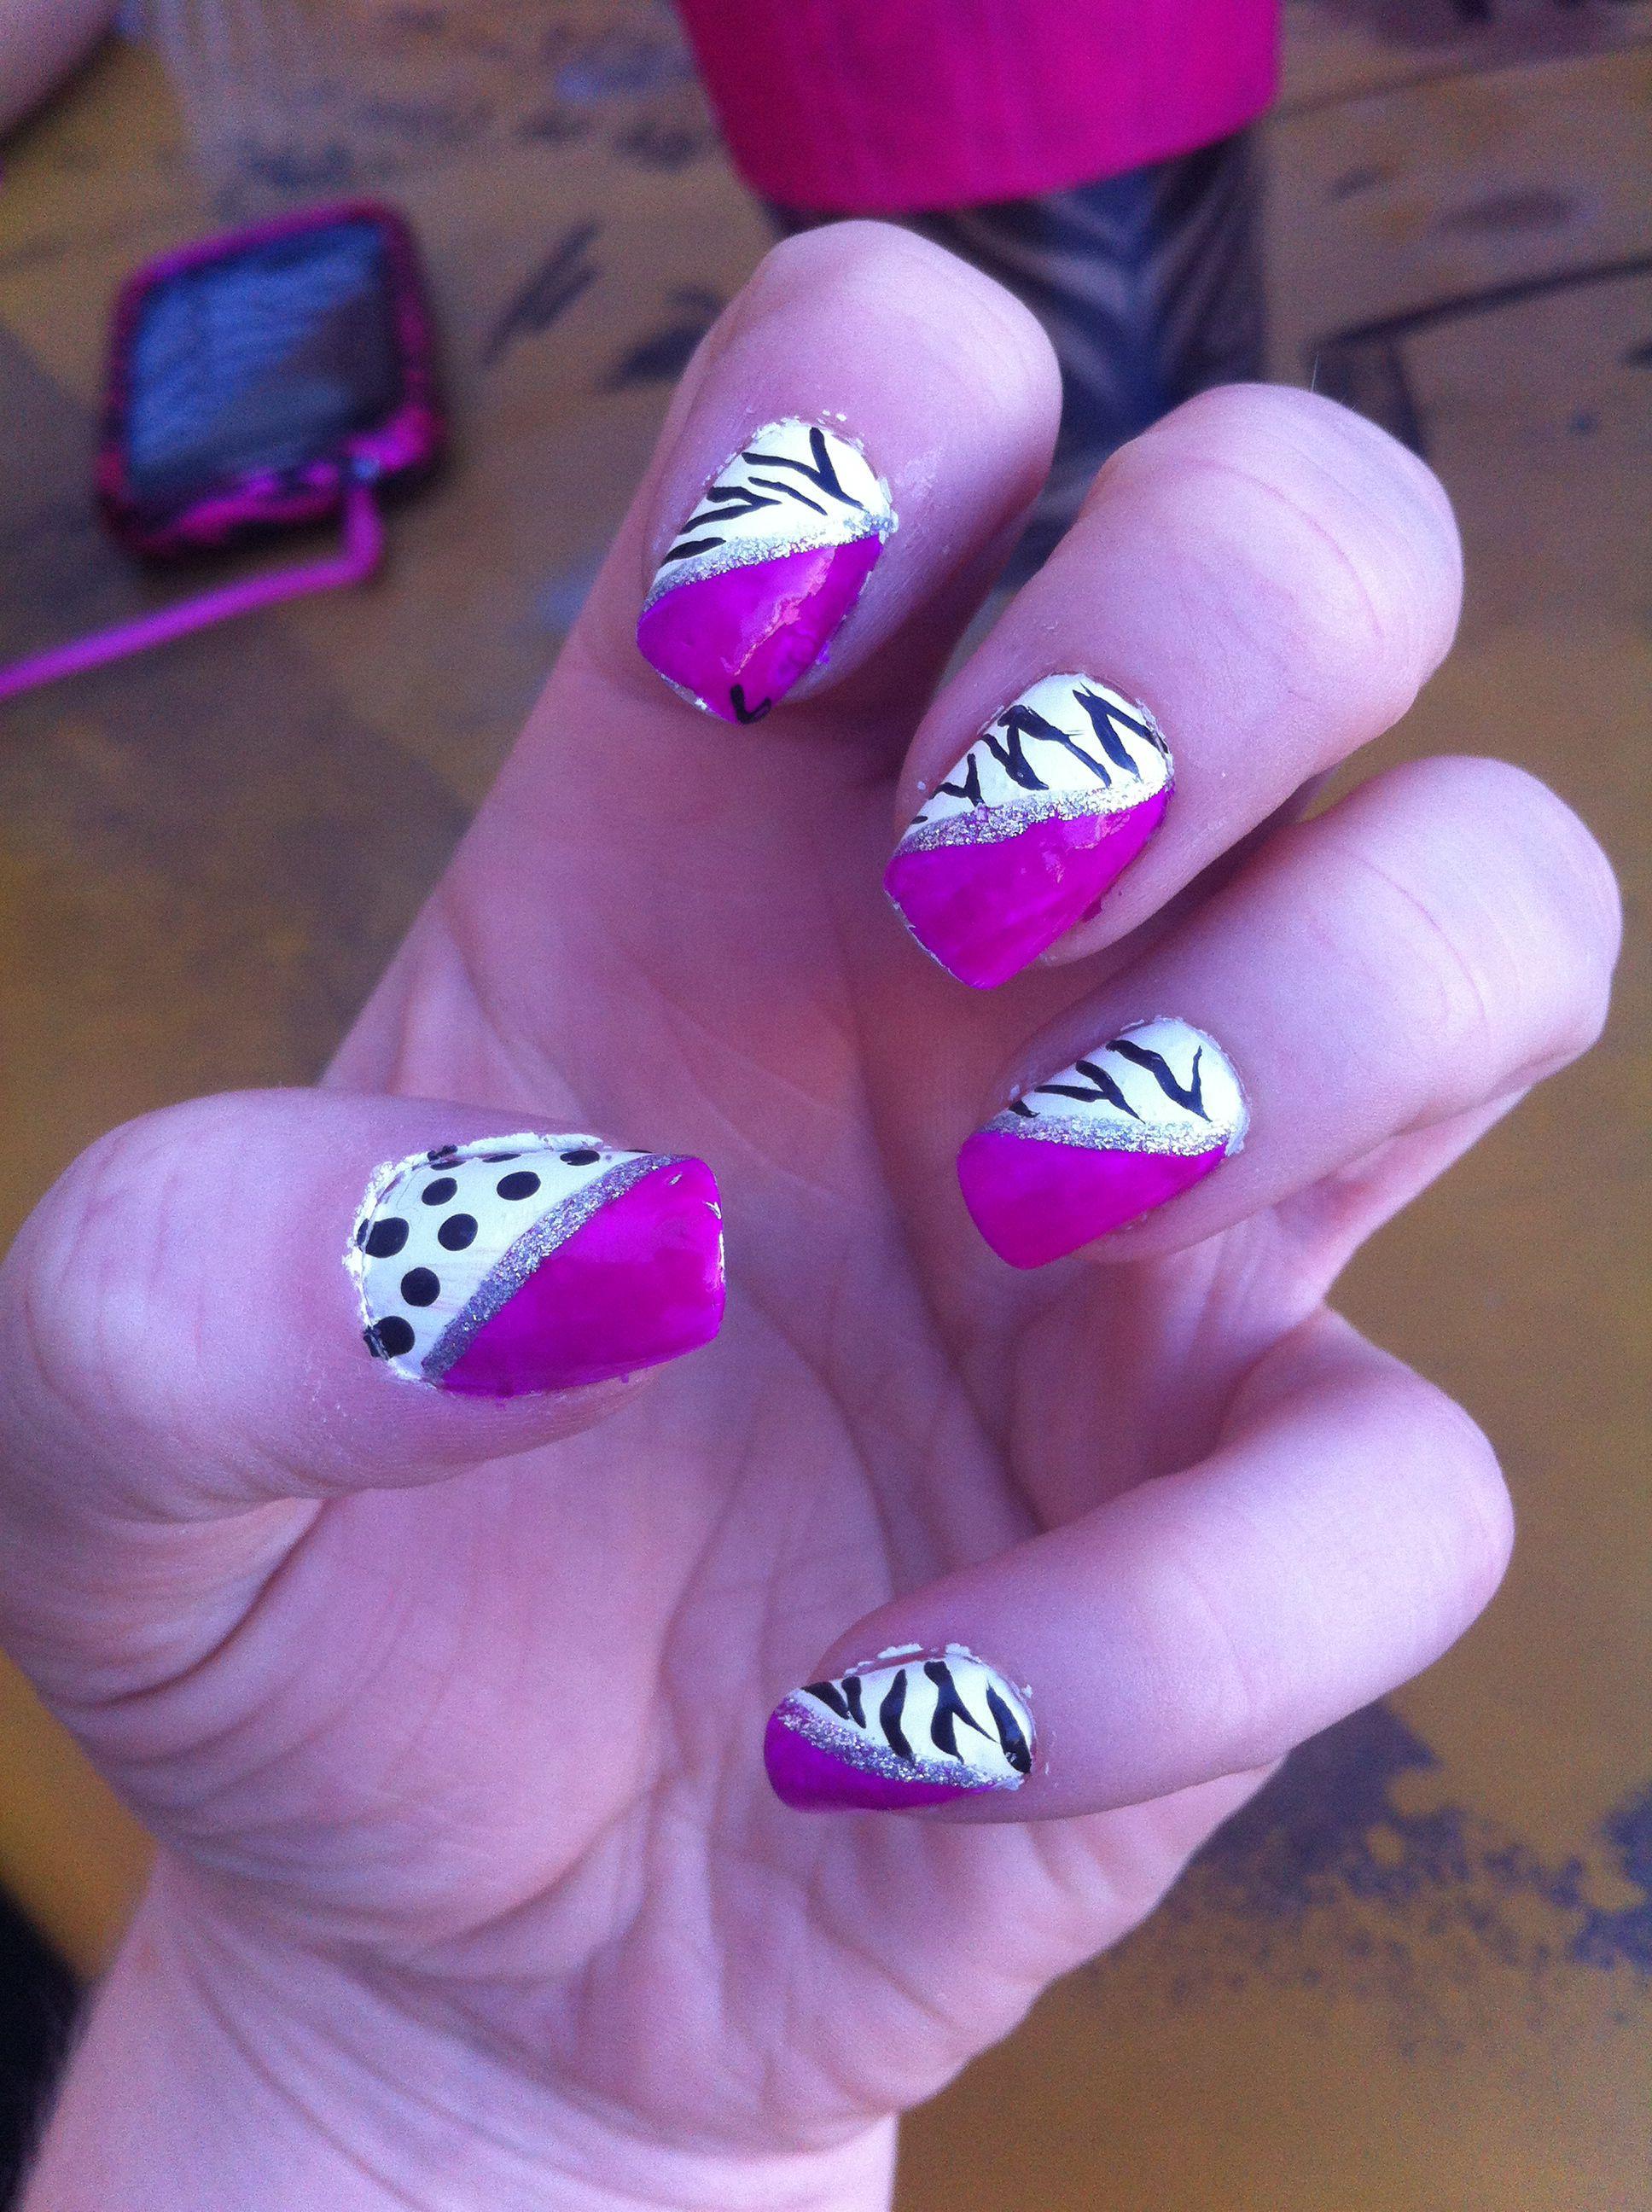 Pin by Jocie Mann on My pins | Nails, Pins, Beauty